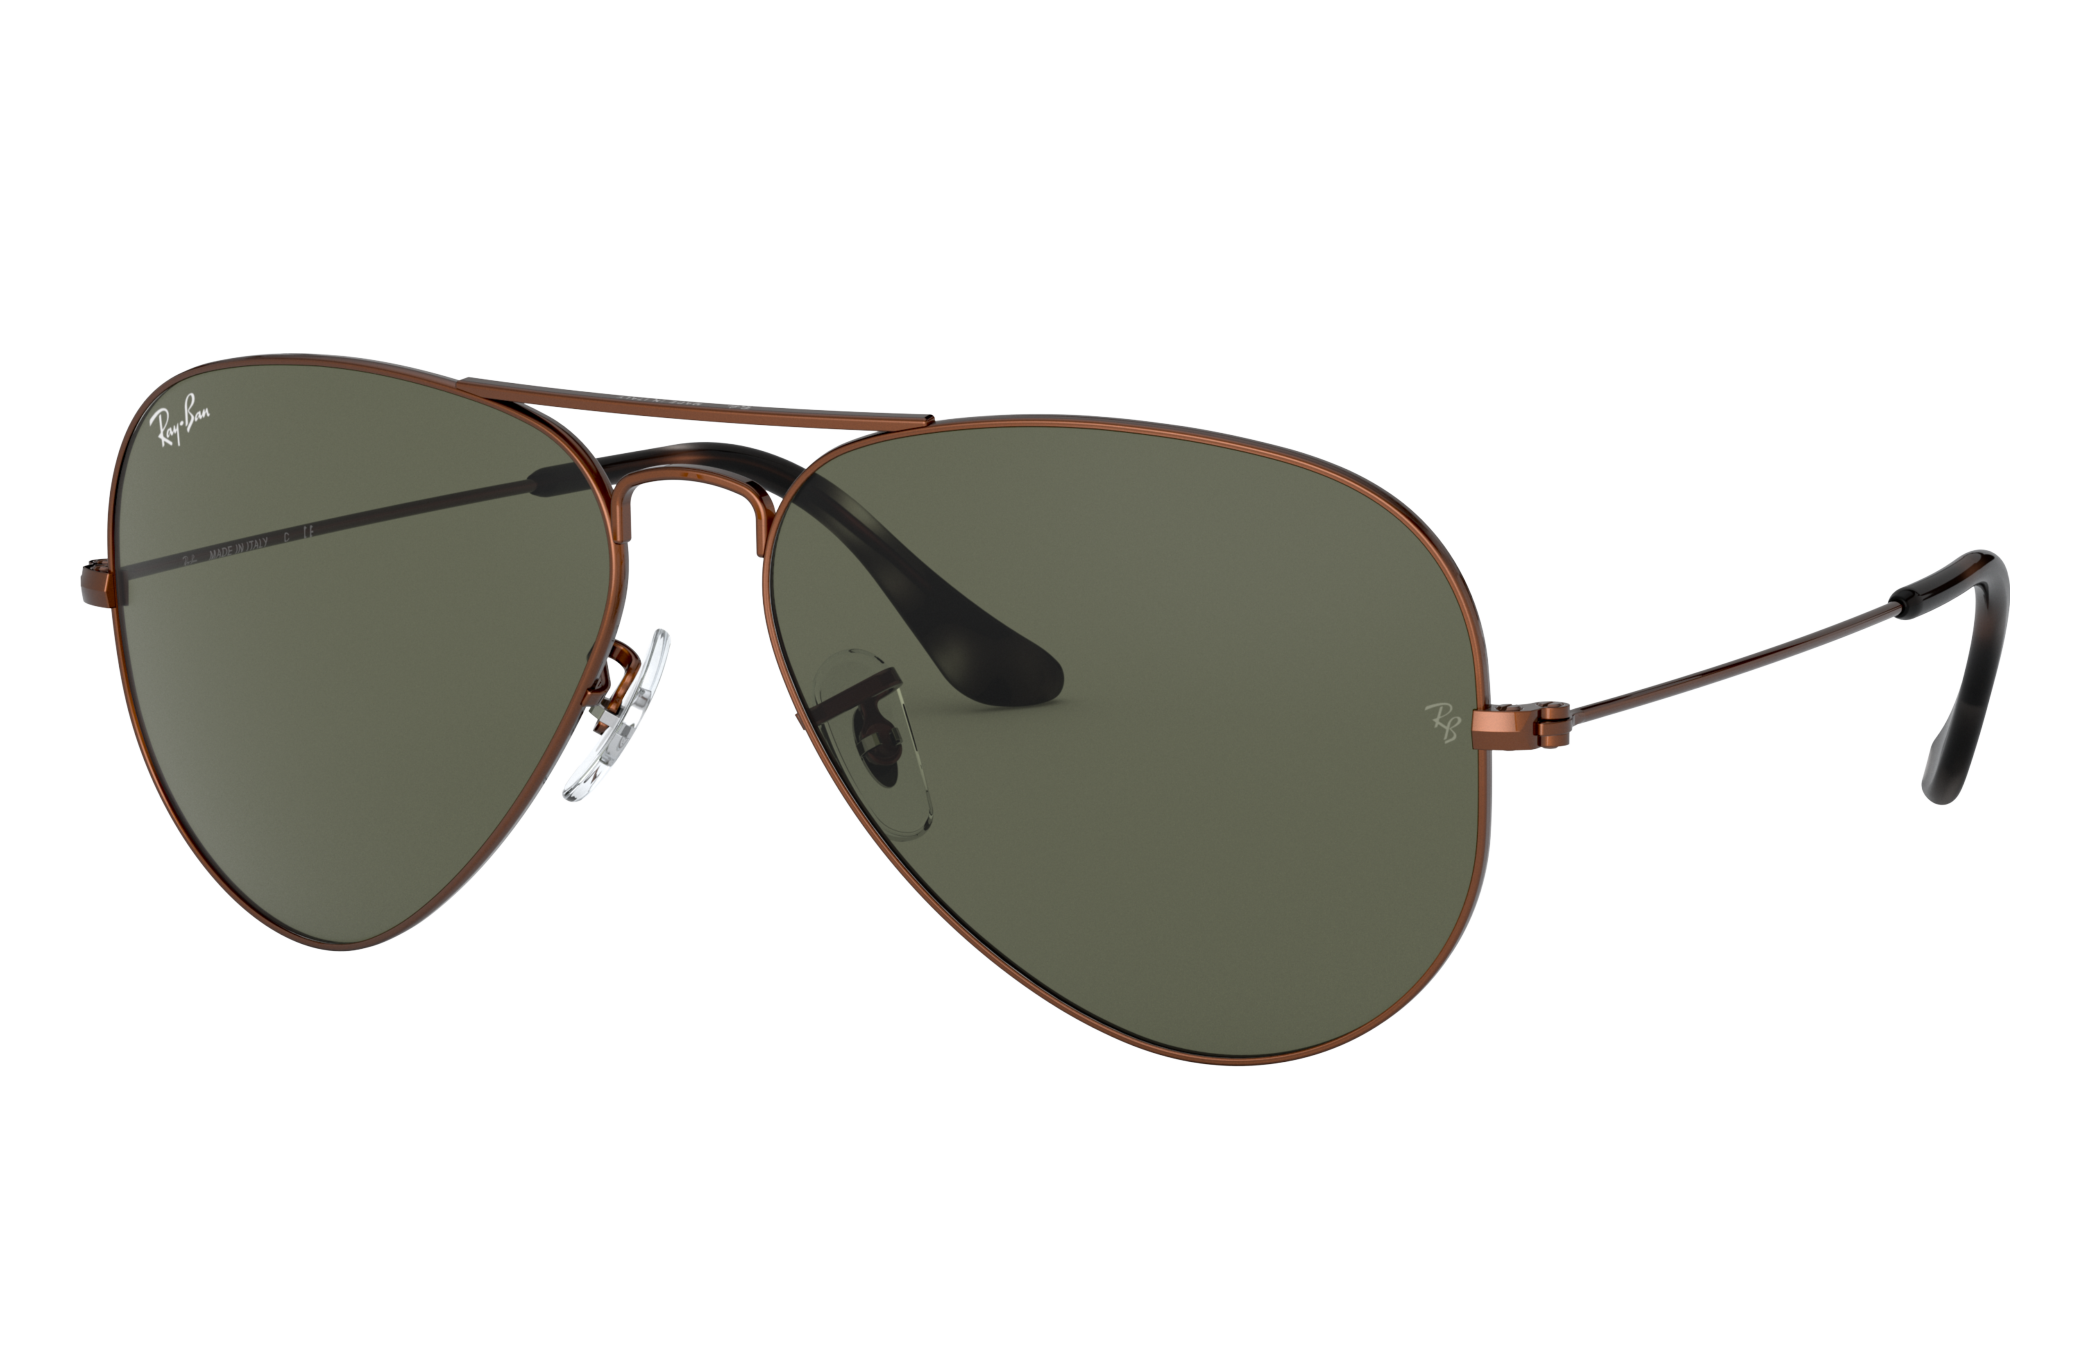 Ray-Ban Aviator Classic Brown Metal, Green Lenses - RB3025